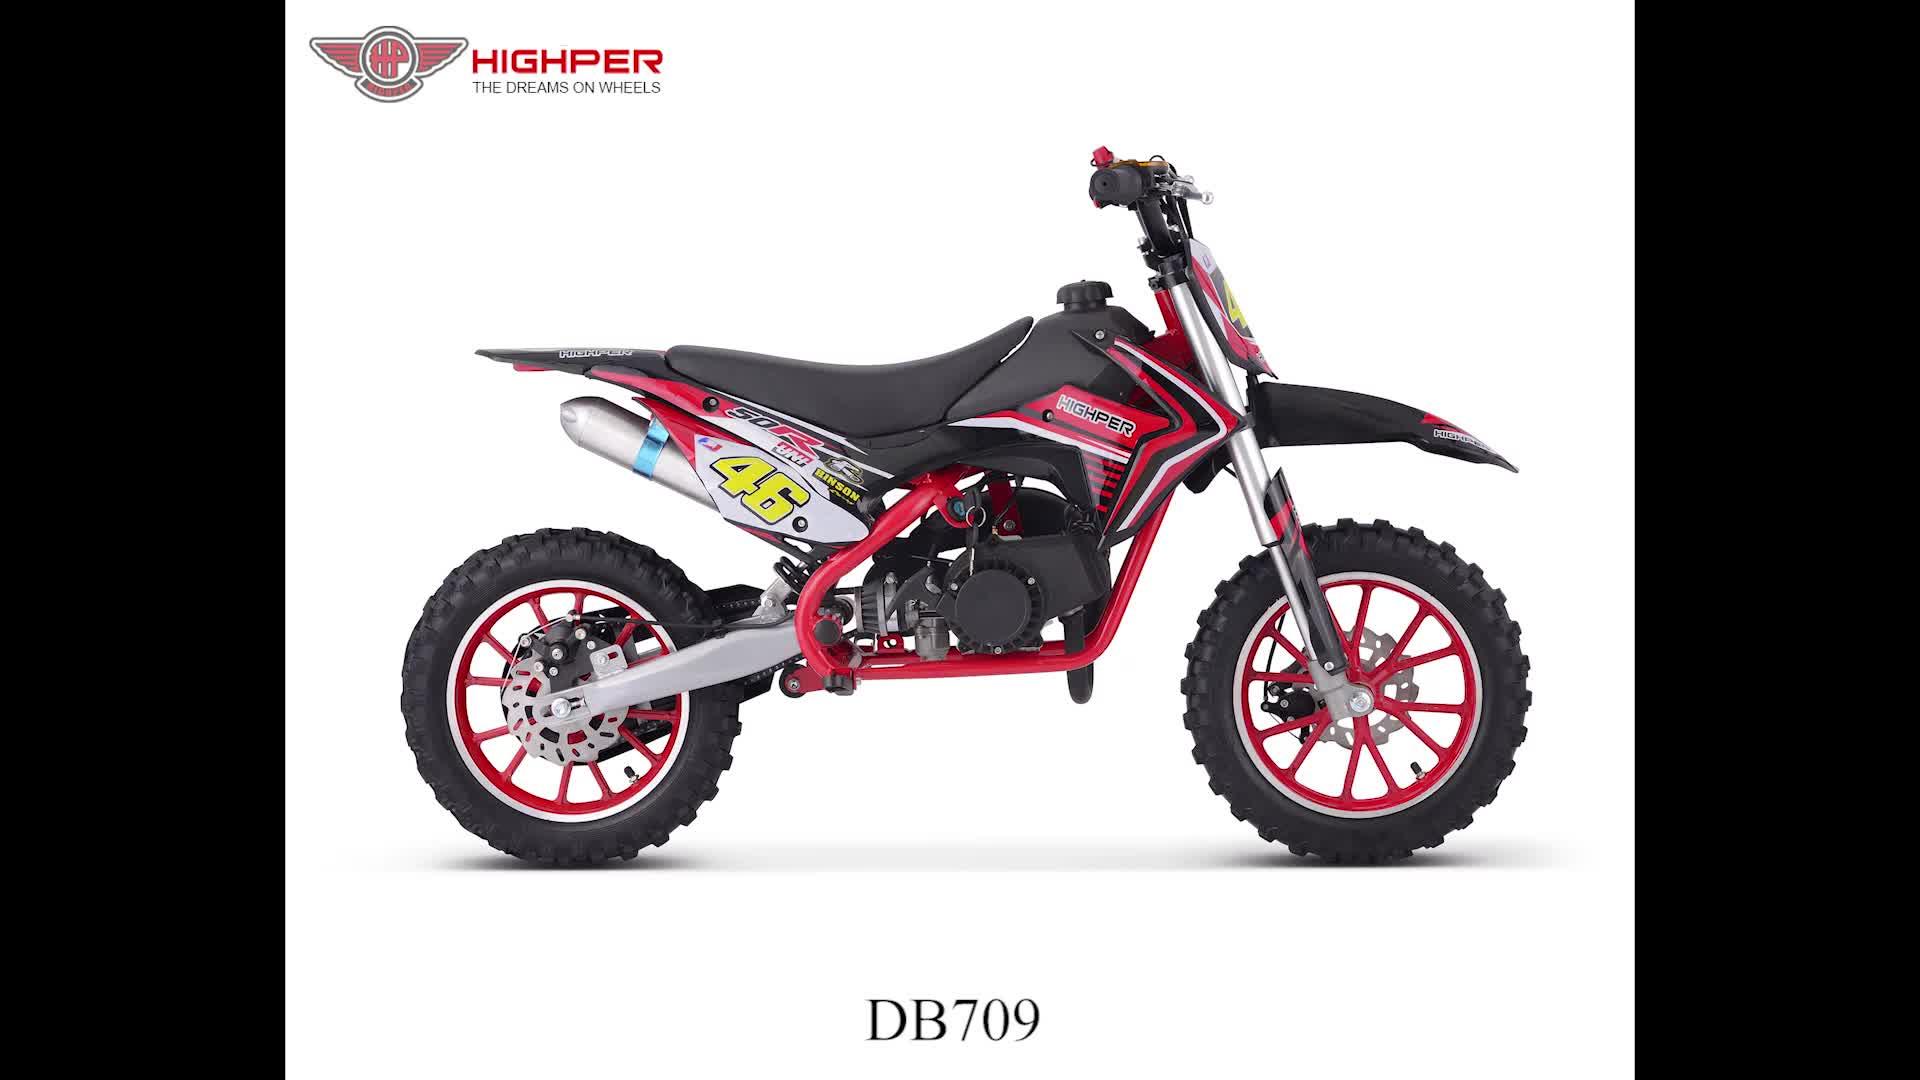 Mini Moto มอเตอร์ไซค์ Moto CROSS สำหรับเด็ก,49cc 50cc 2 จังหวะ MINI Dirt BIKE,รถจักรยานยนต์,